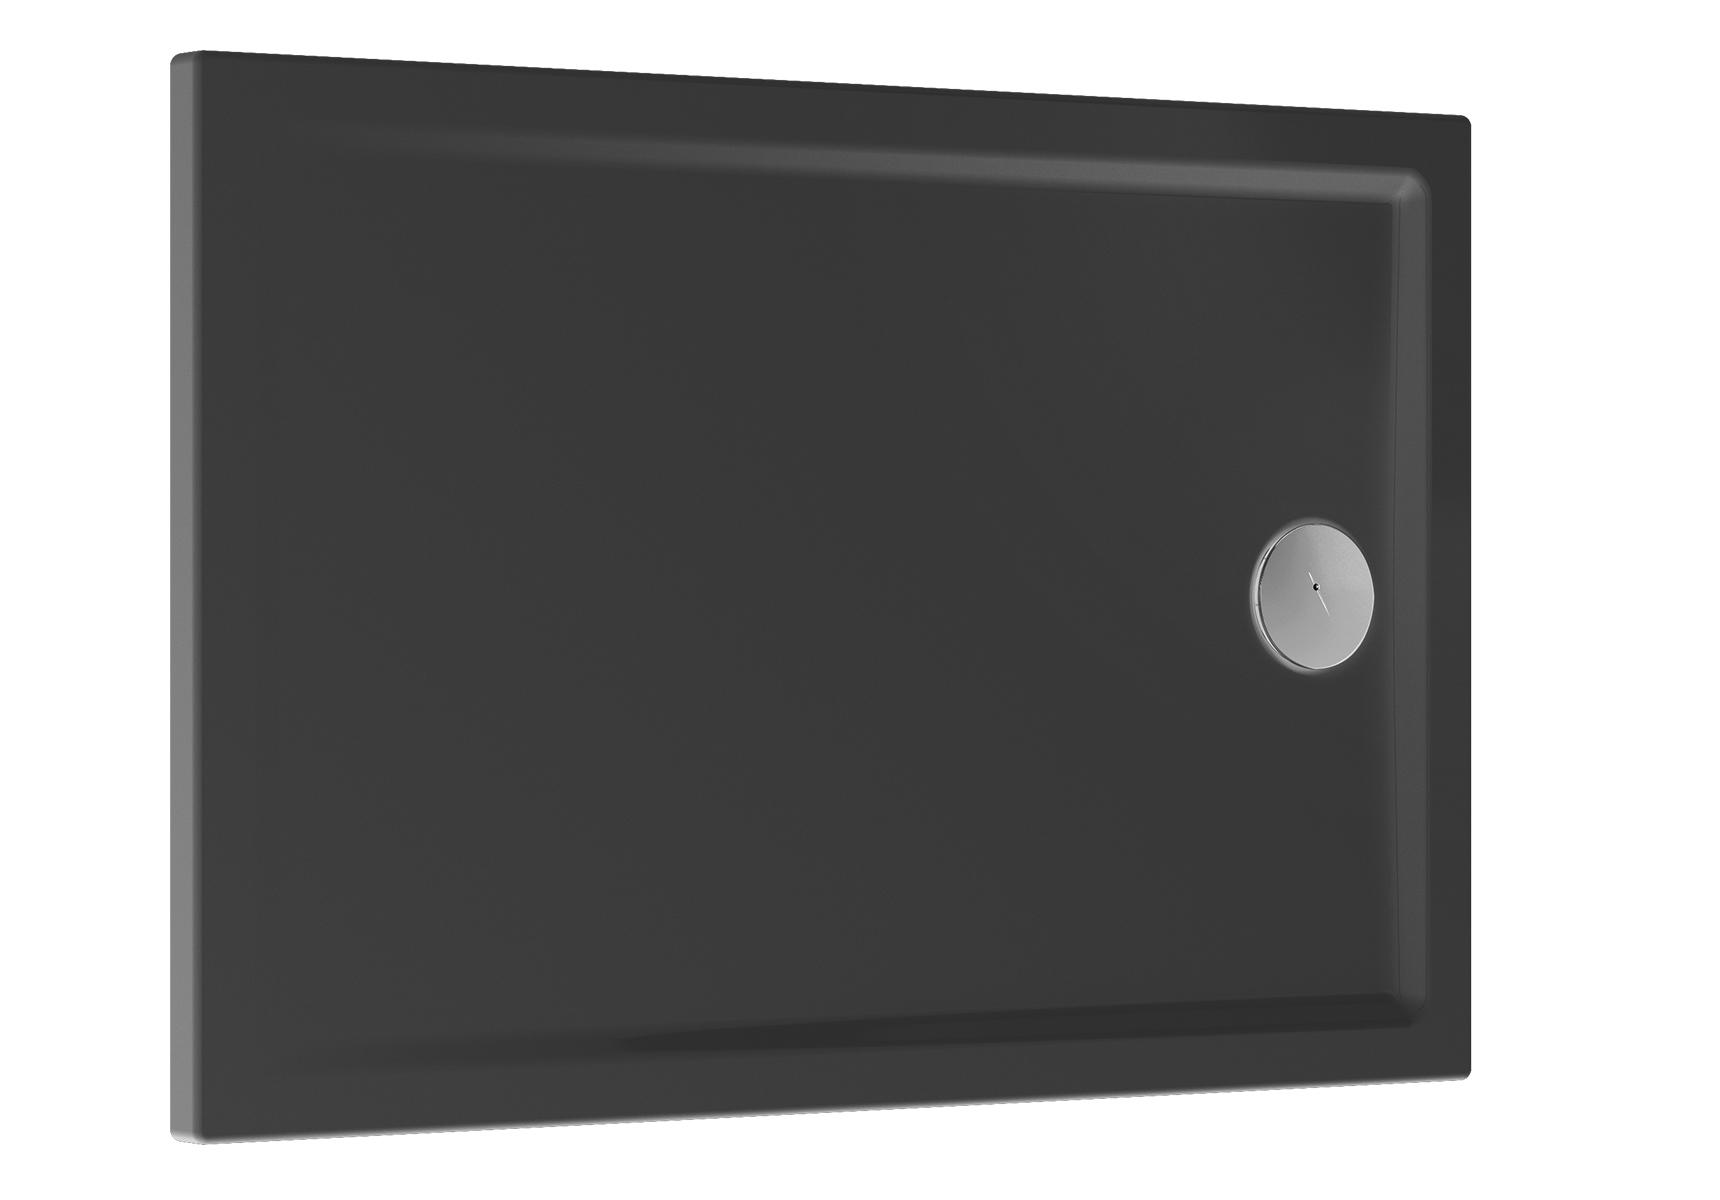 Cascade receveur ultra plat en céramique, 120  x  90 cm, anthraciteacite